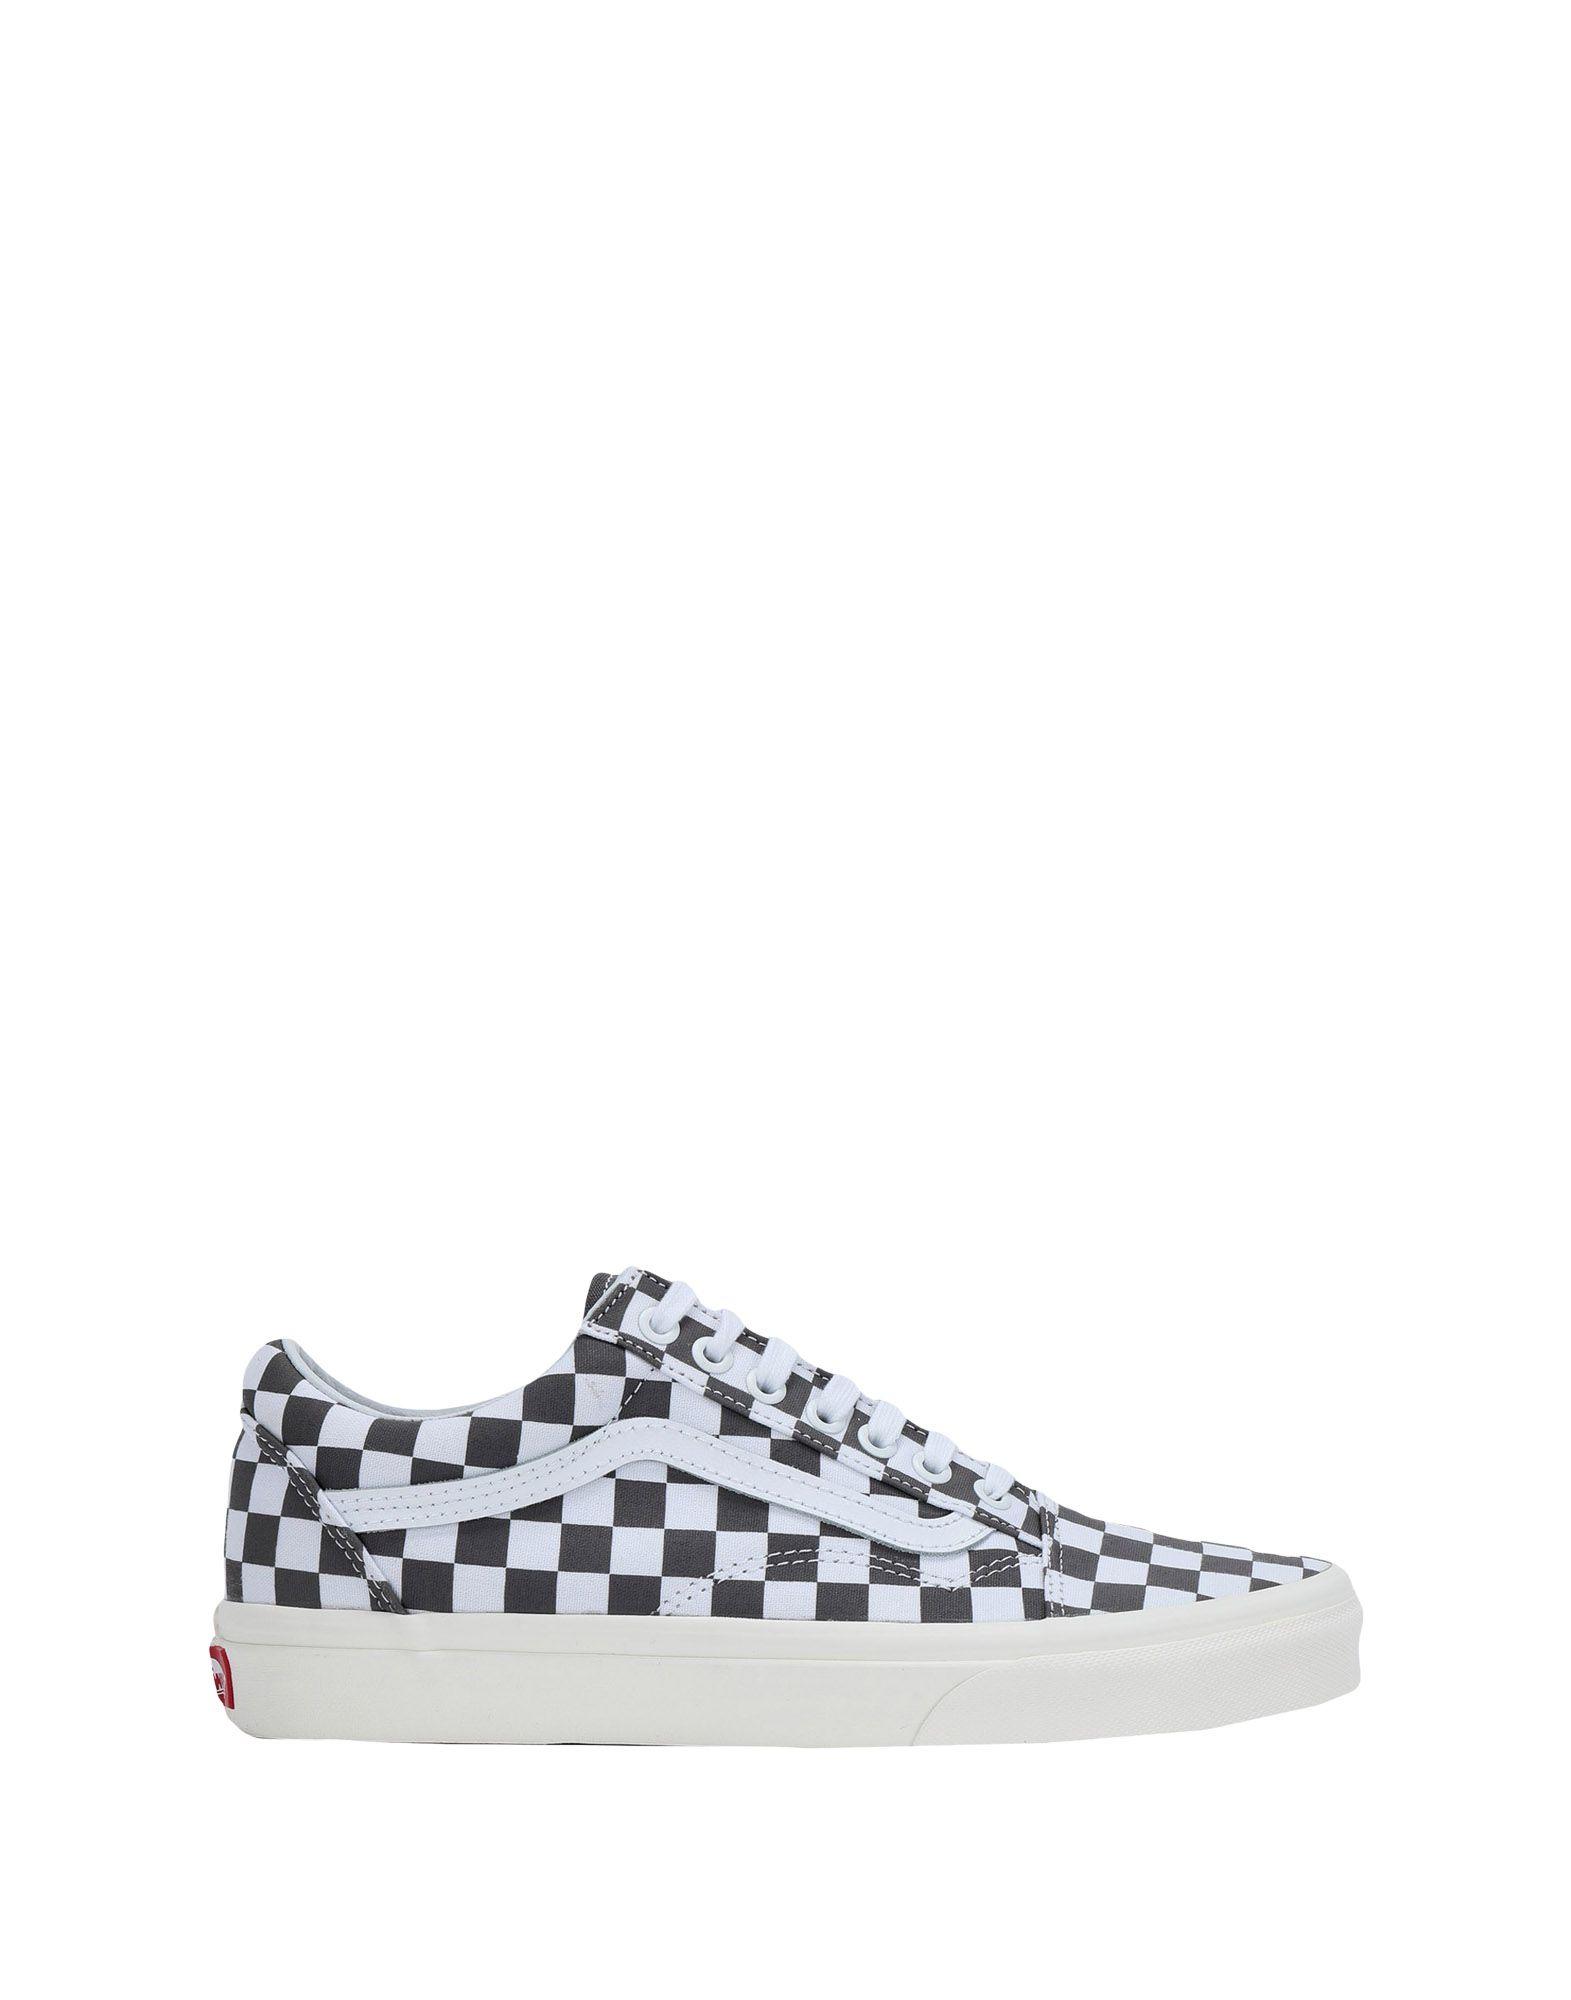 Scarpe da - Ginnastica Vans Ua Old Skool (Checkerboard) - da Donna - 11577072RT 69b179